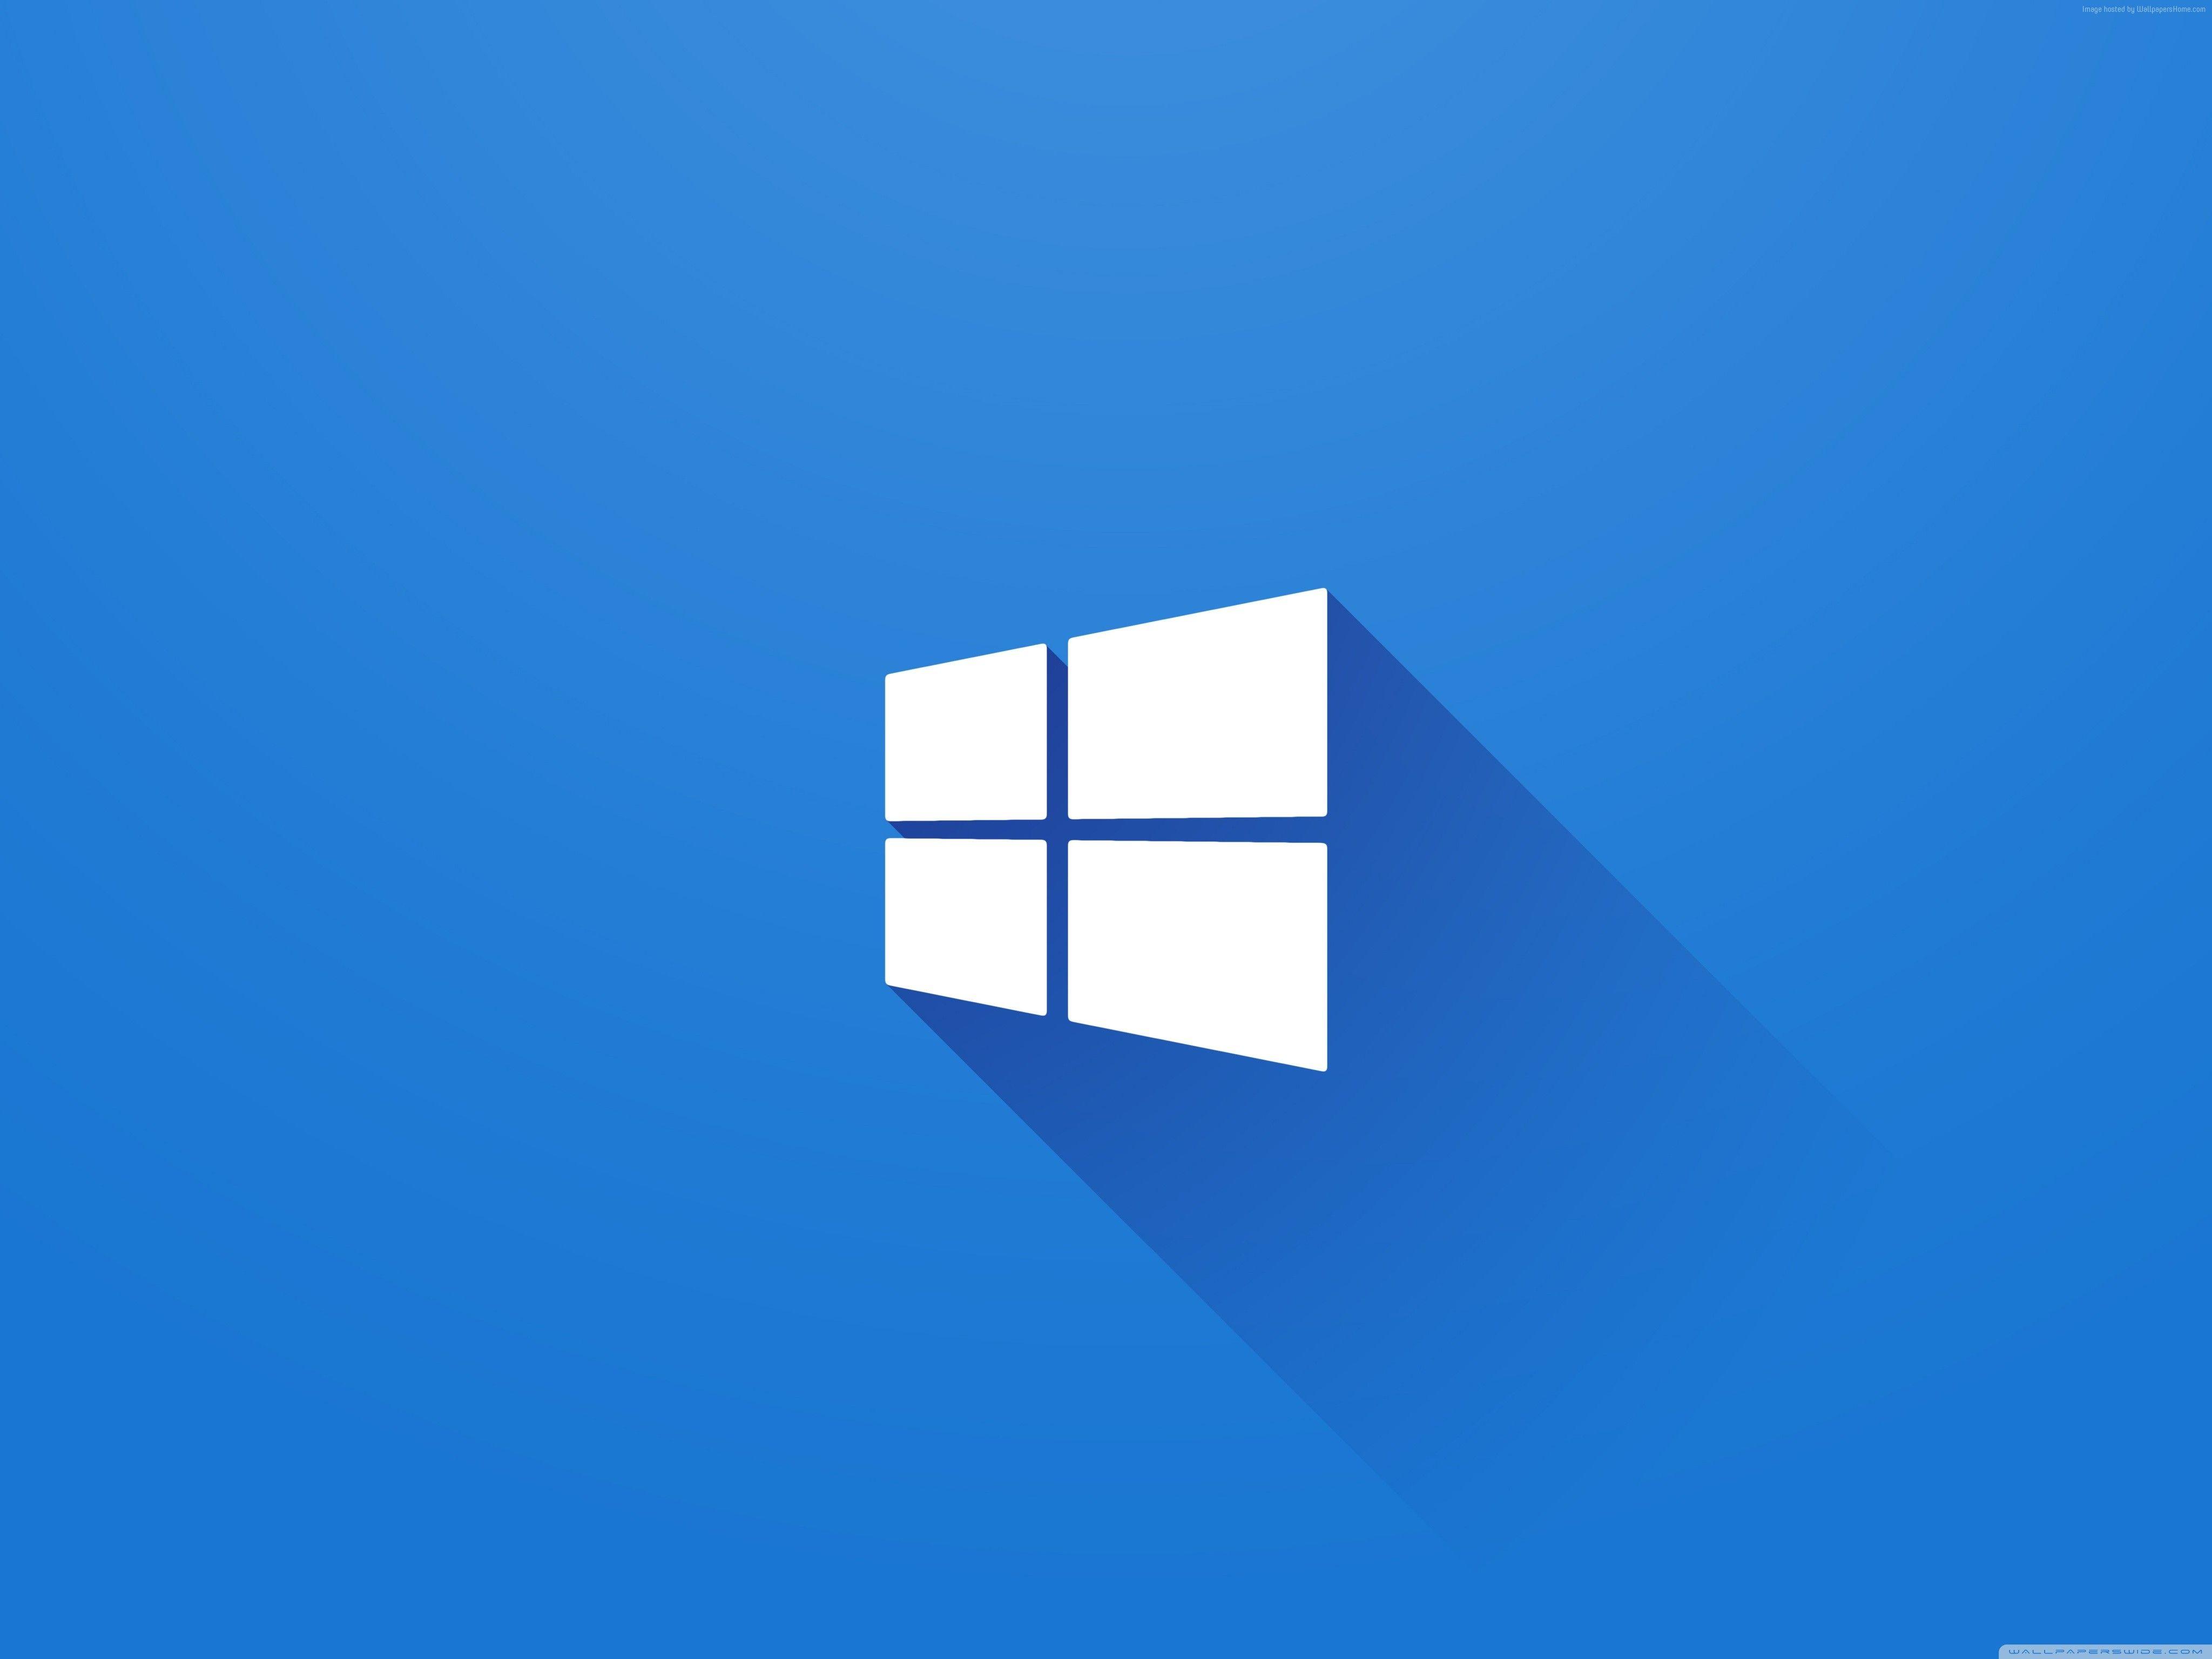 Windows 10 Wallpaper Os Windows 10 Microsoft Blue Sea Woman